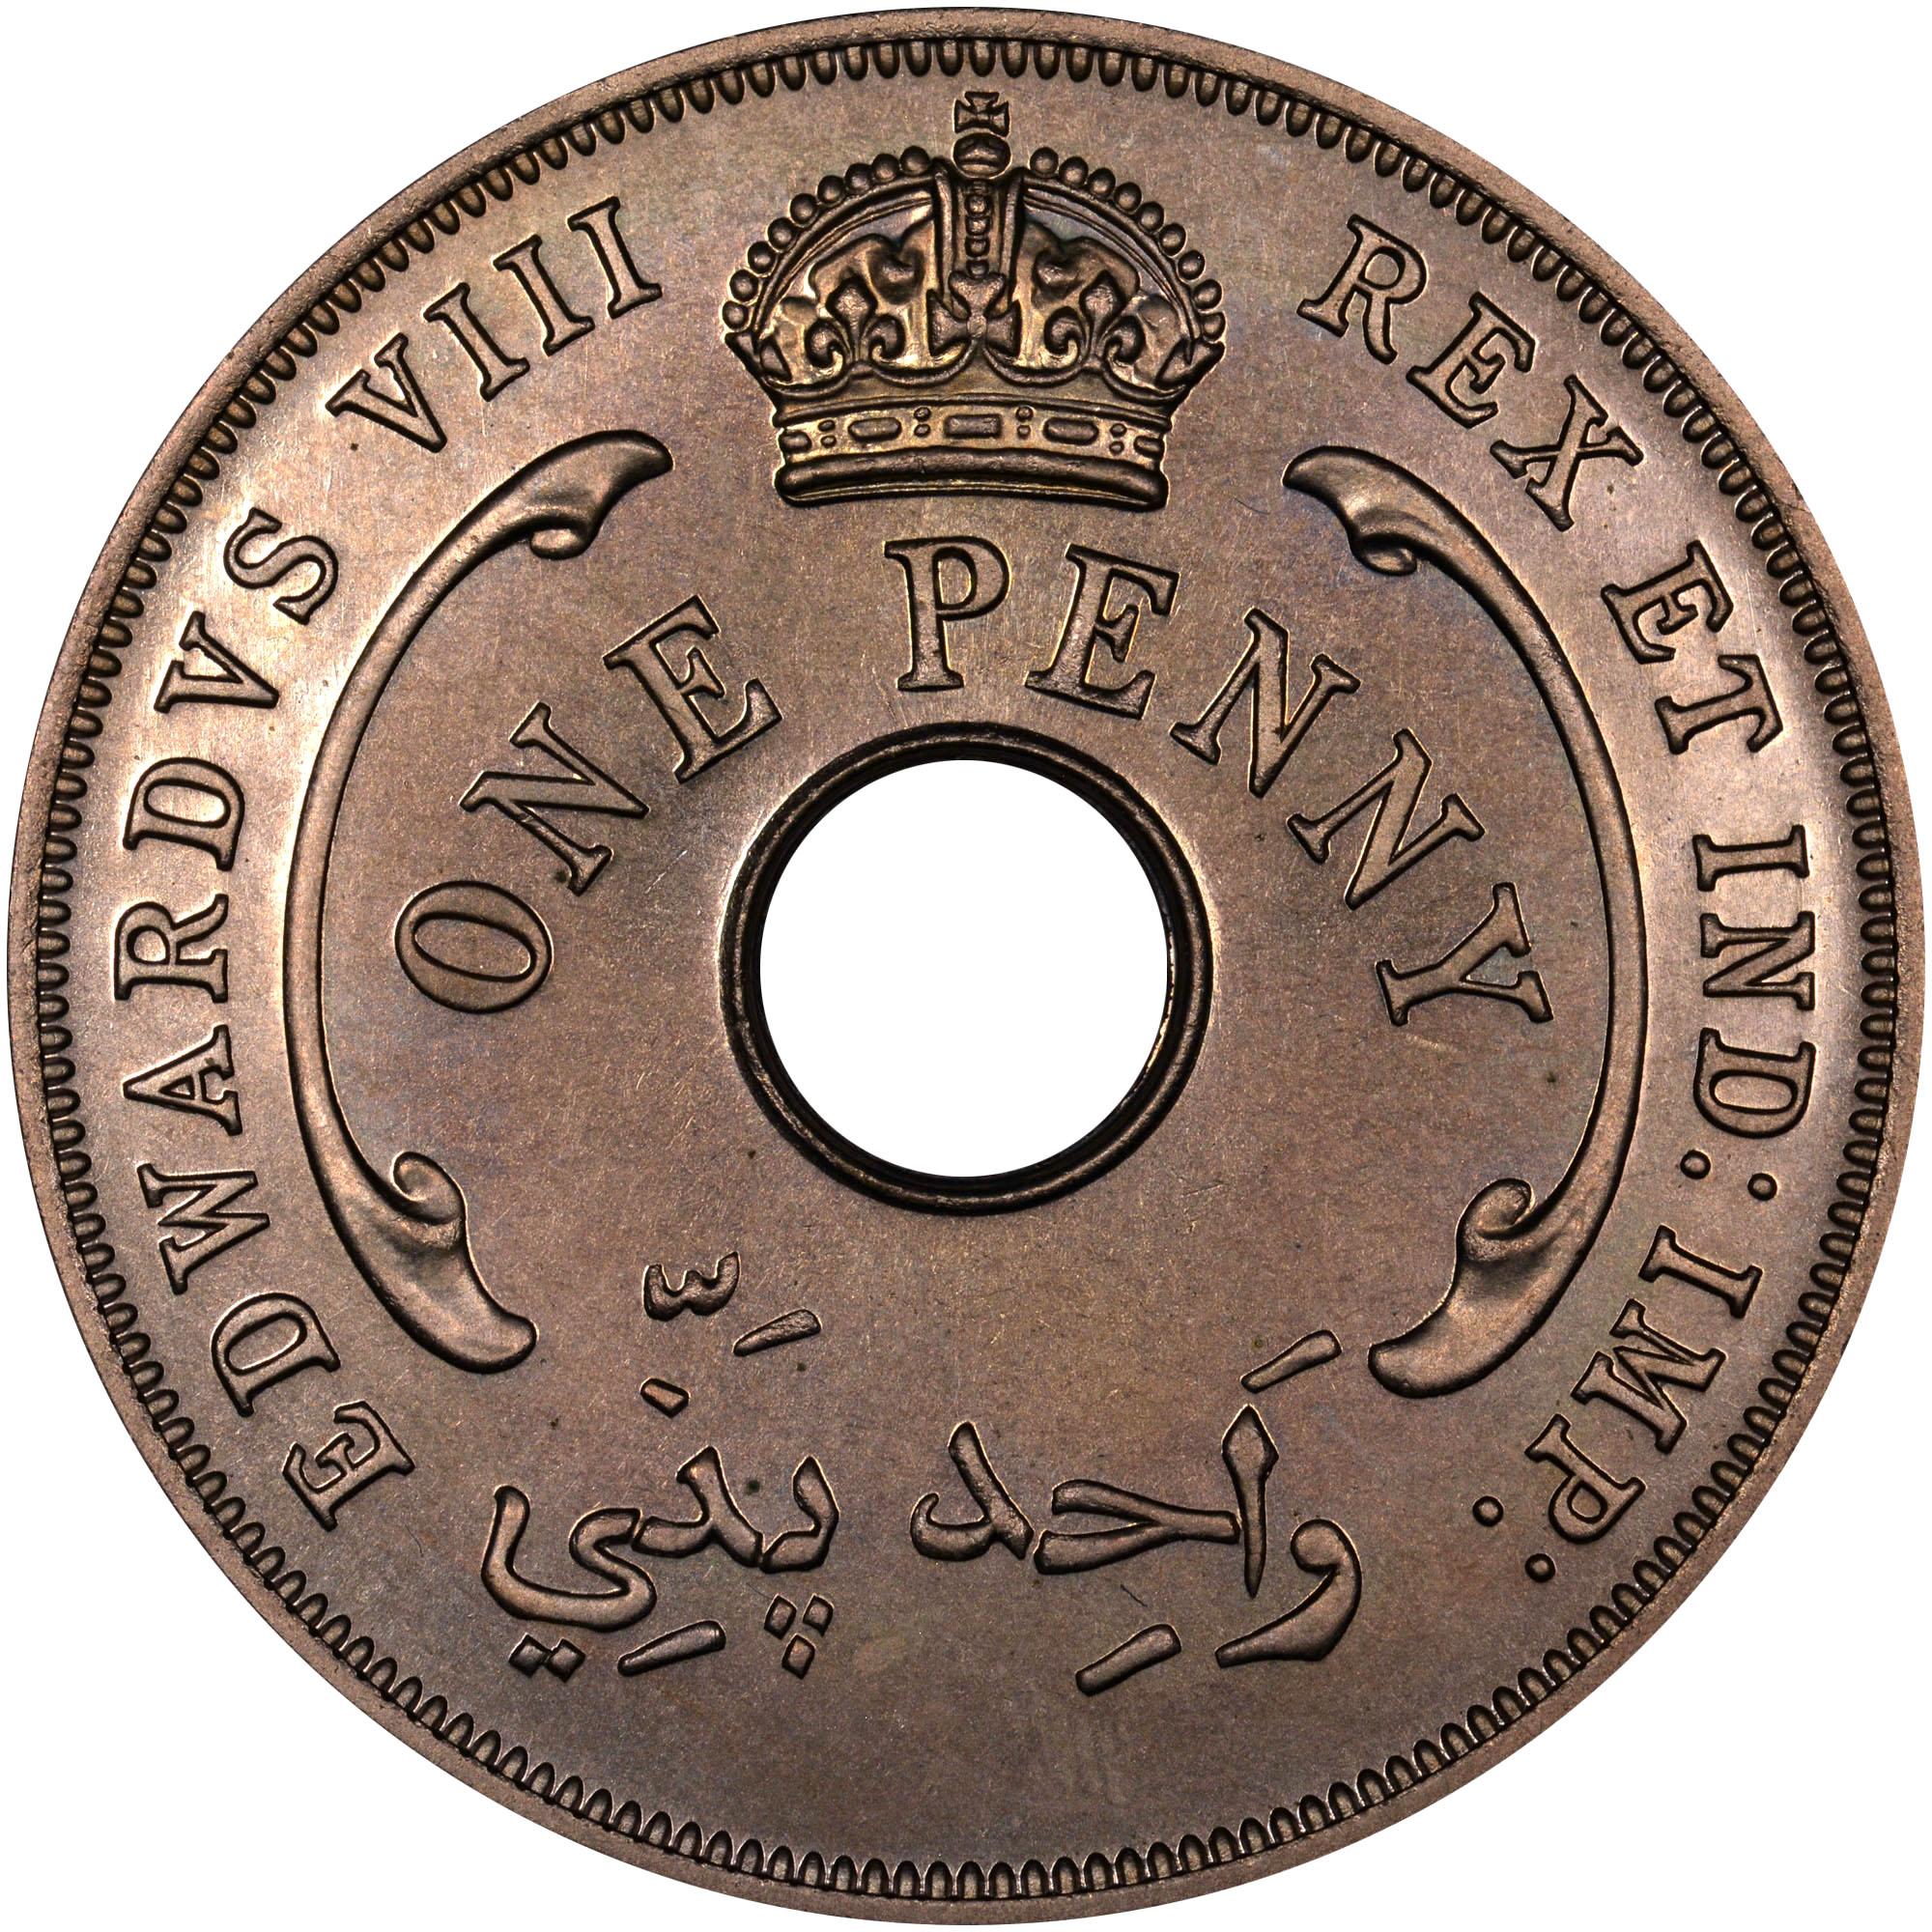 1936 British West Africa Penny obverse